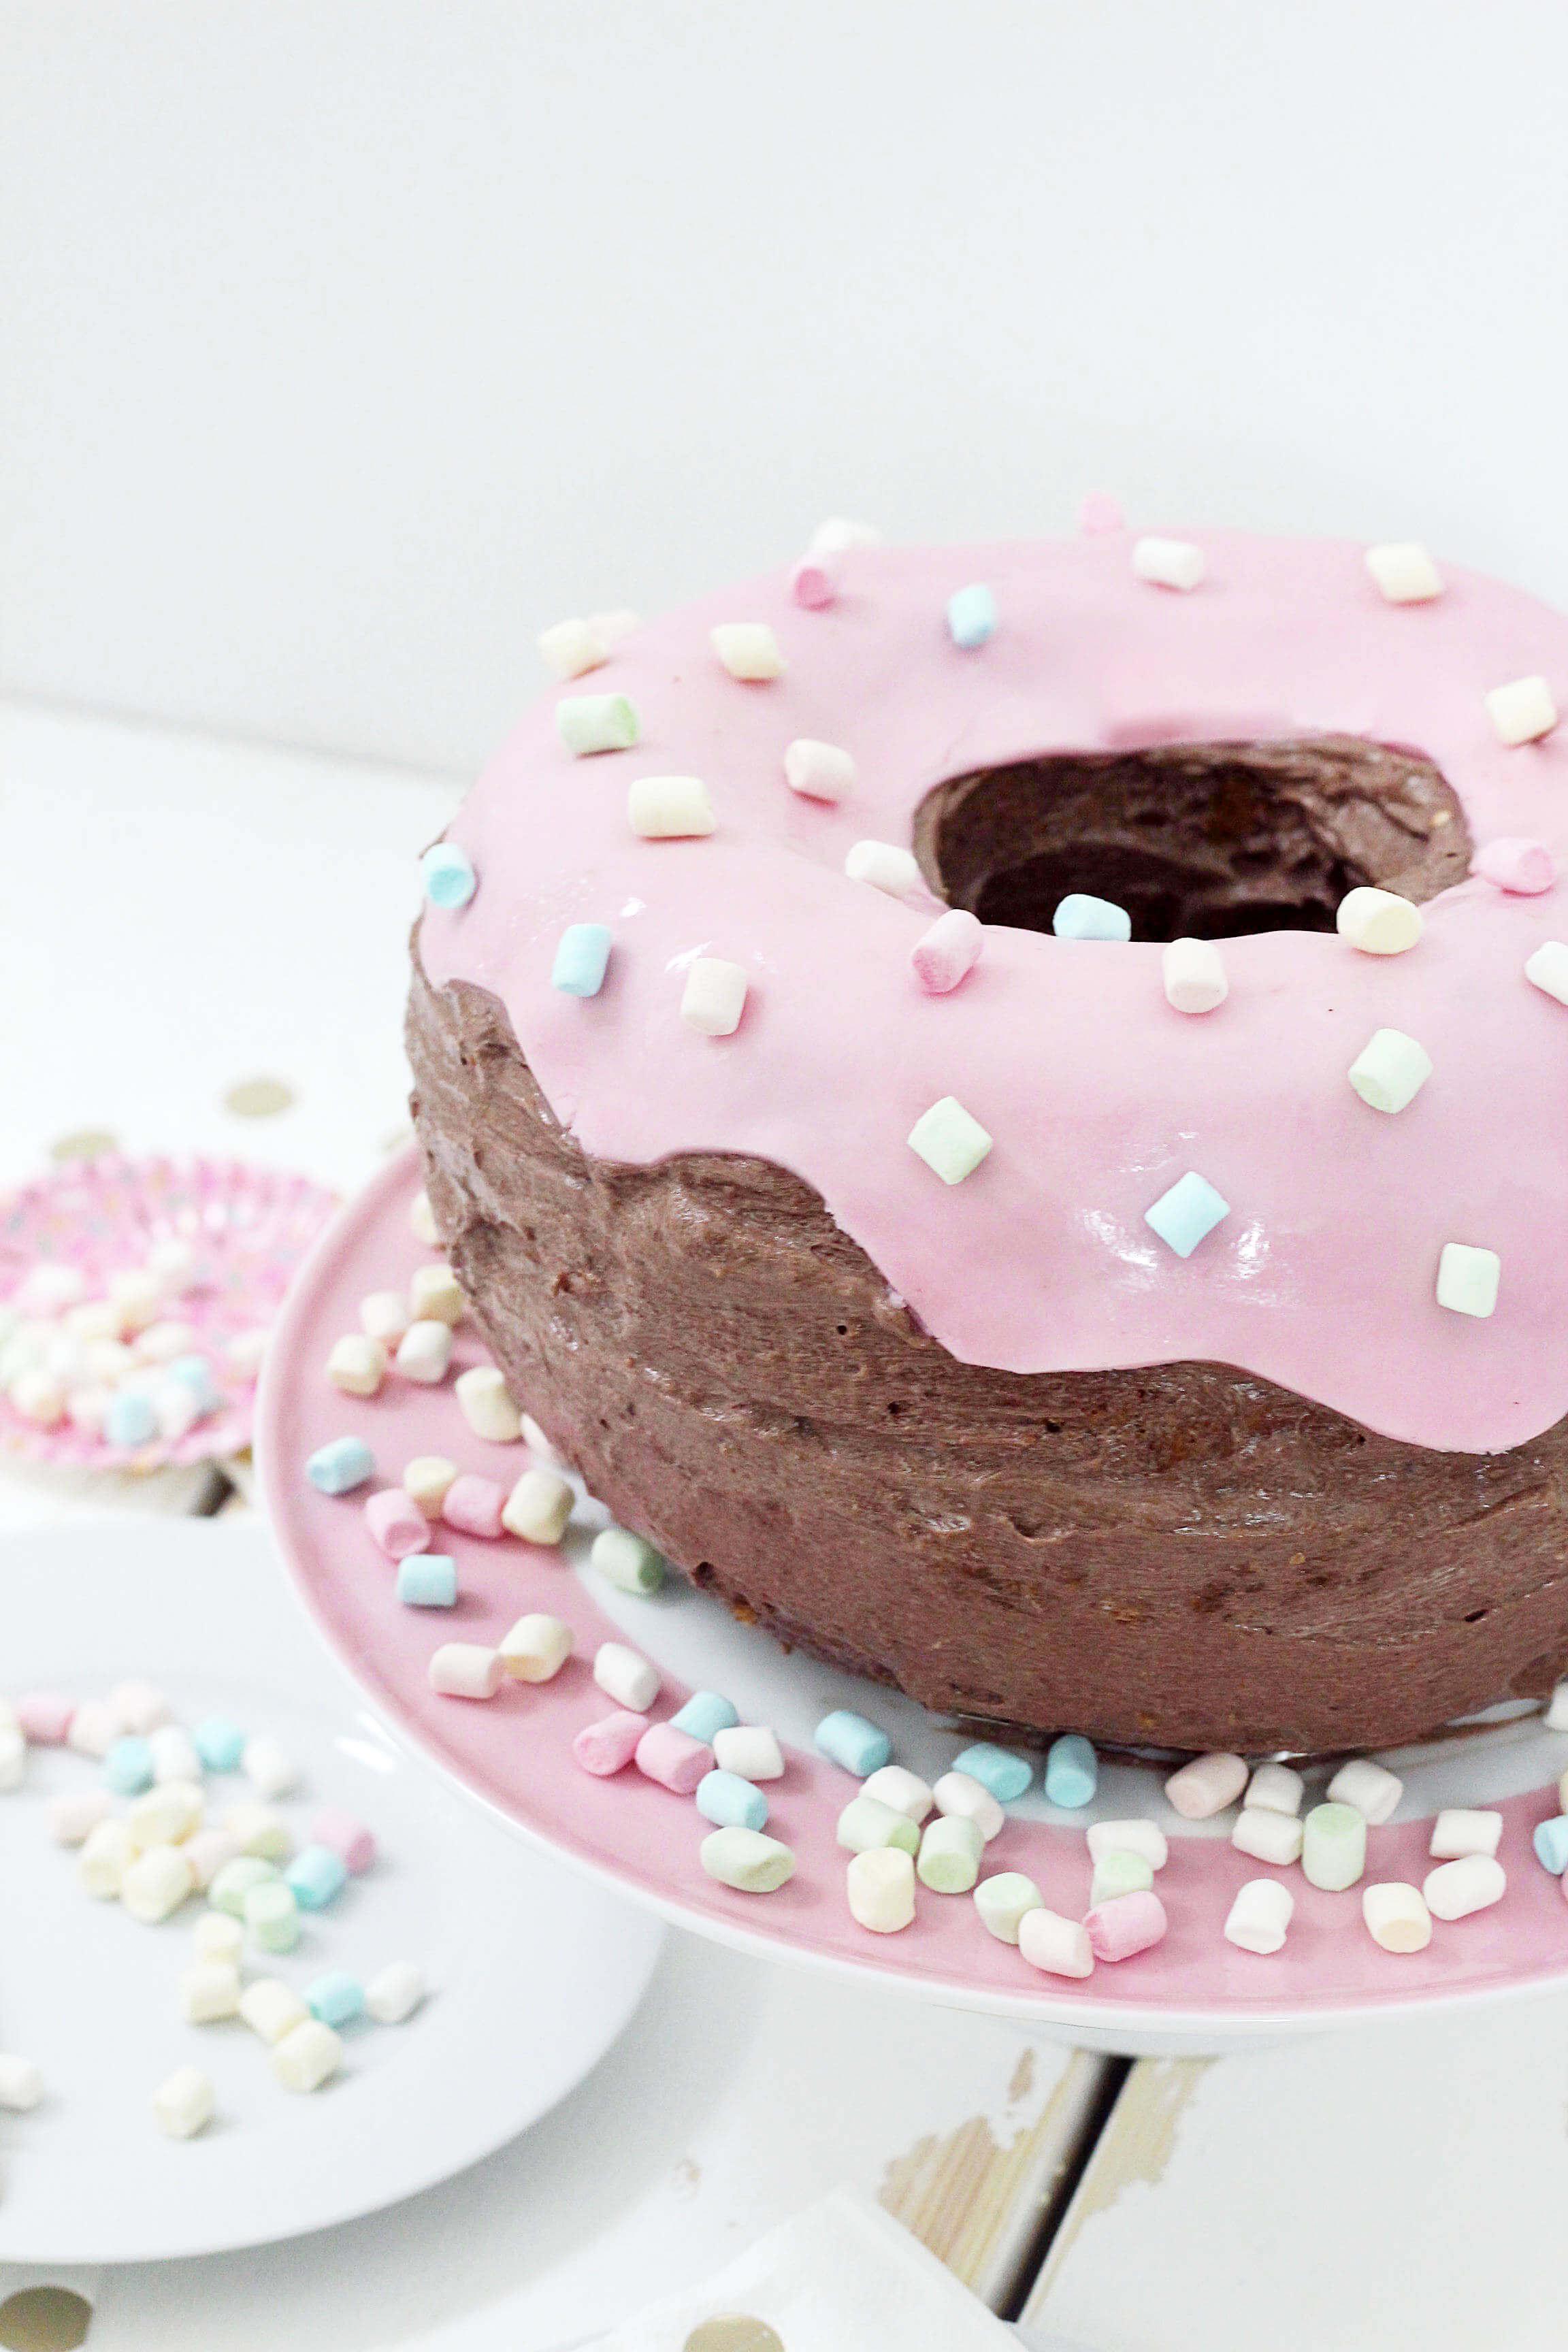 rezept-geburtstag-partydonut-kuchen-backen-diy-blog